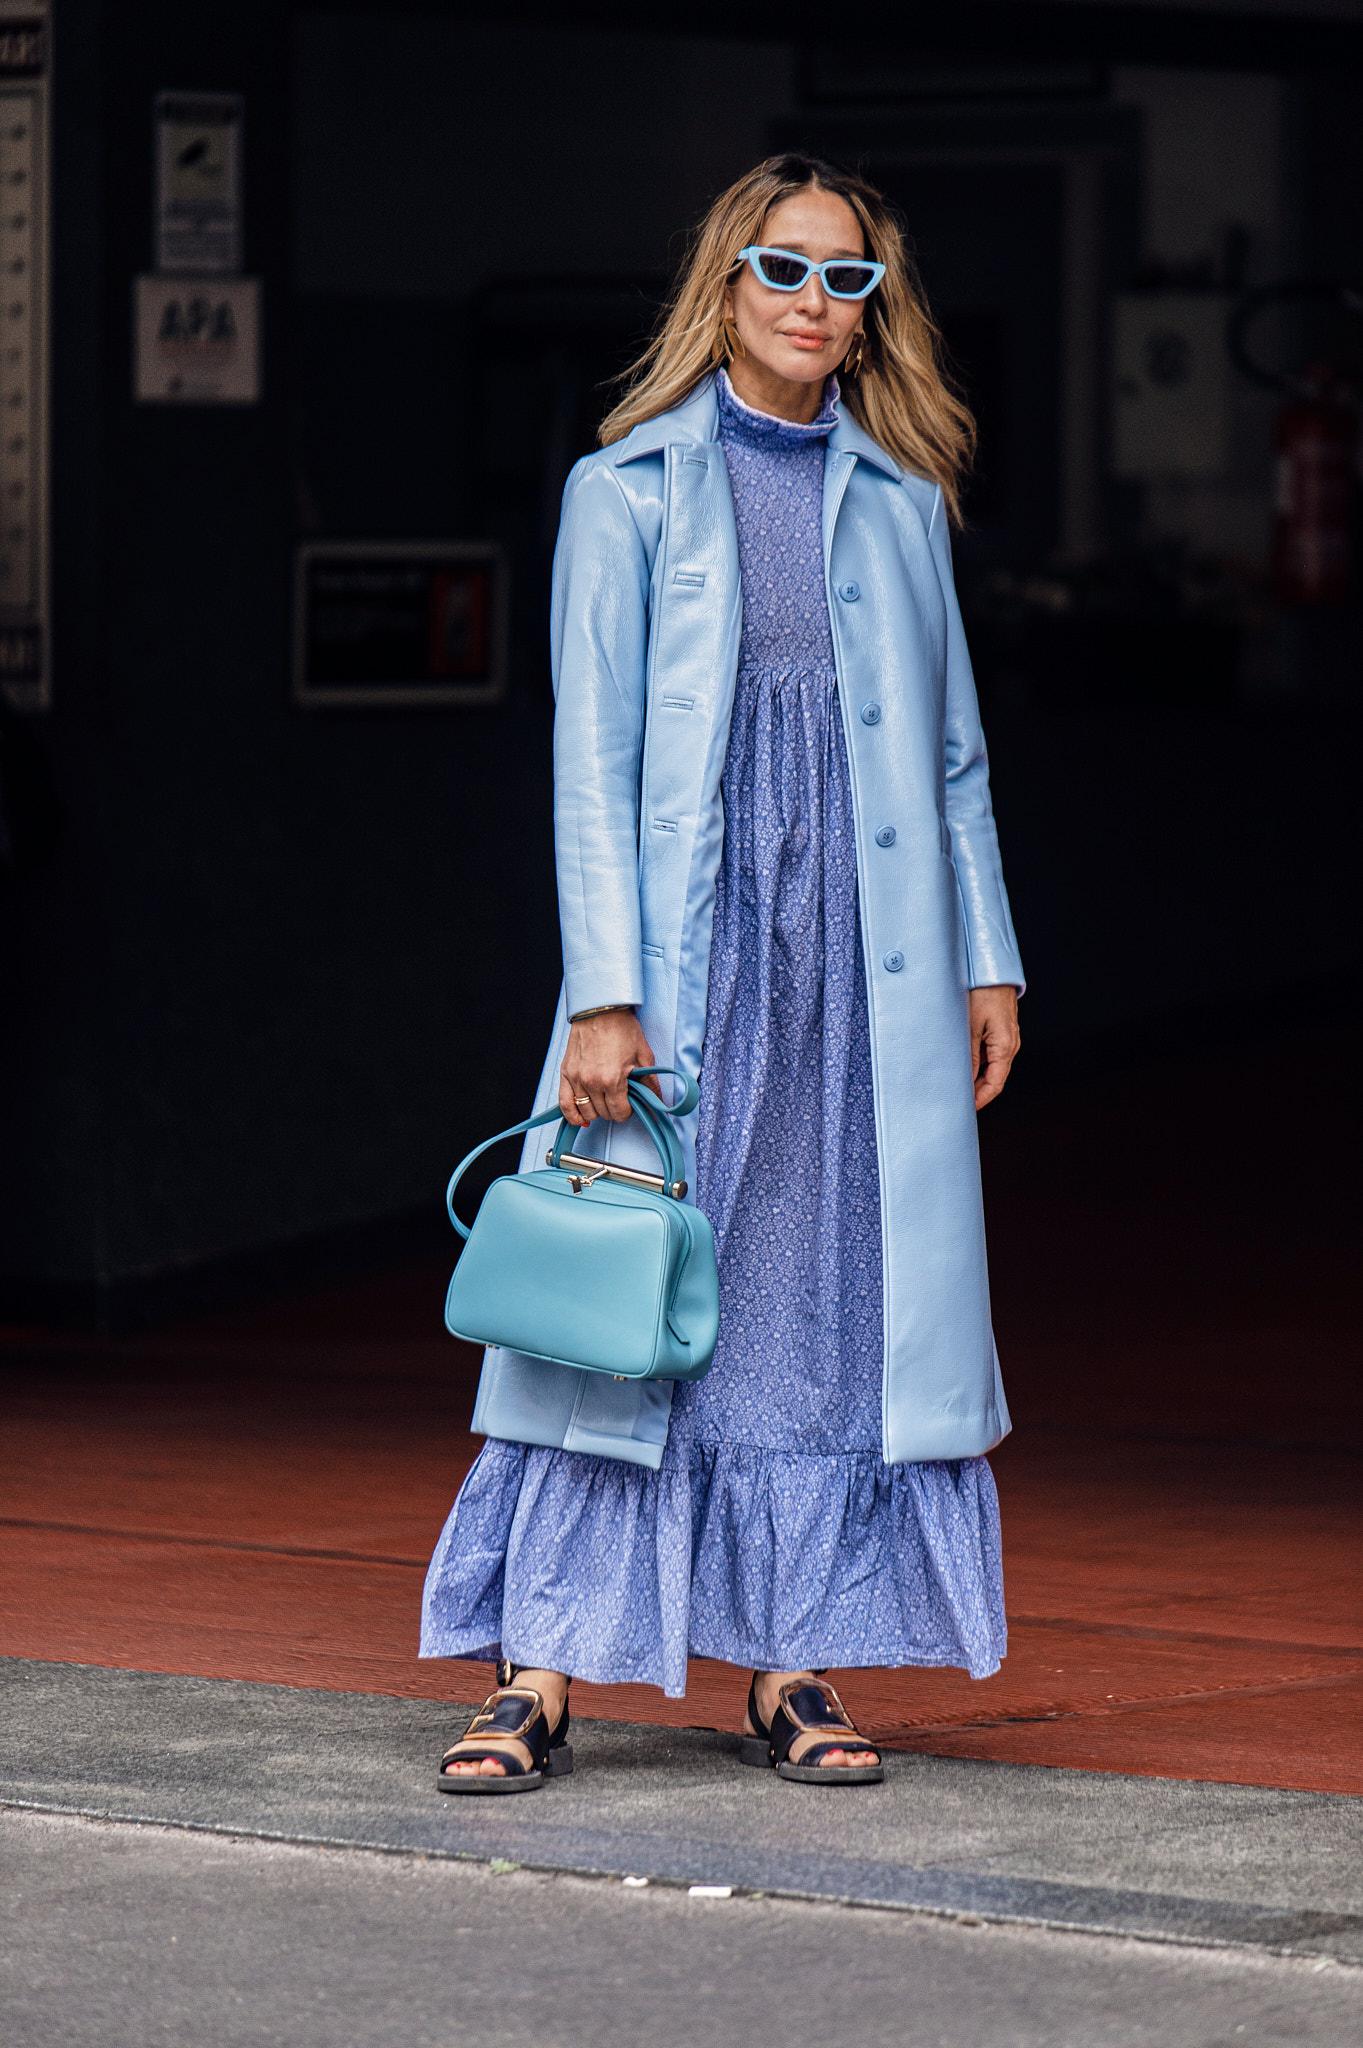 Tiany Kiriloff - Milan Fashion Week SS20